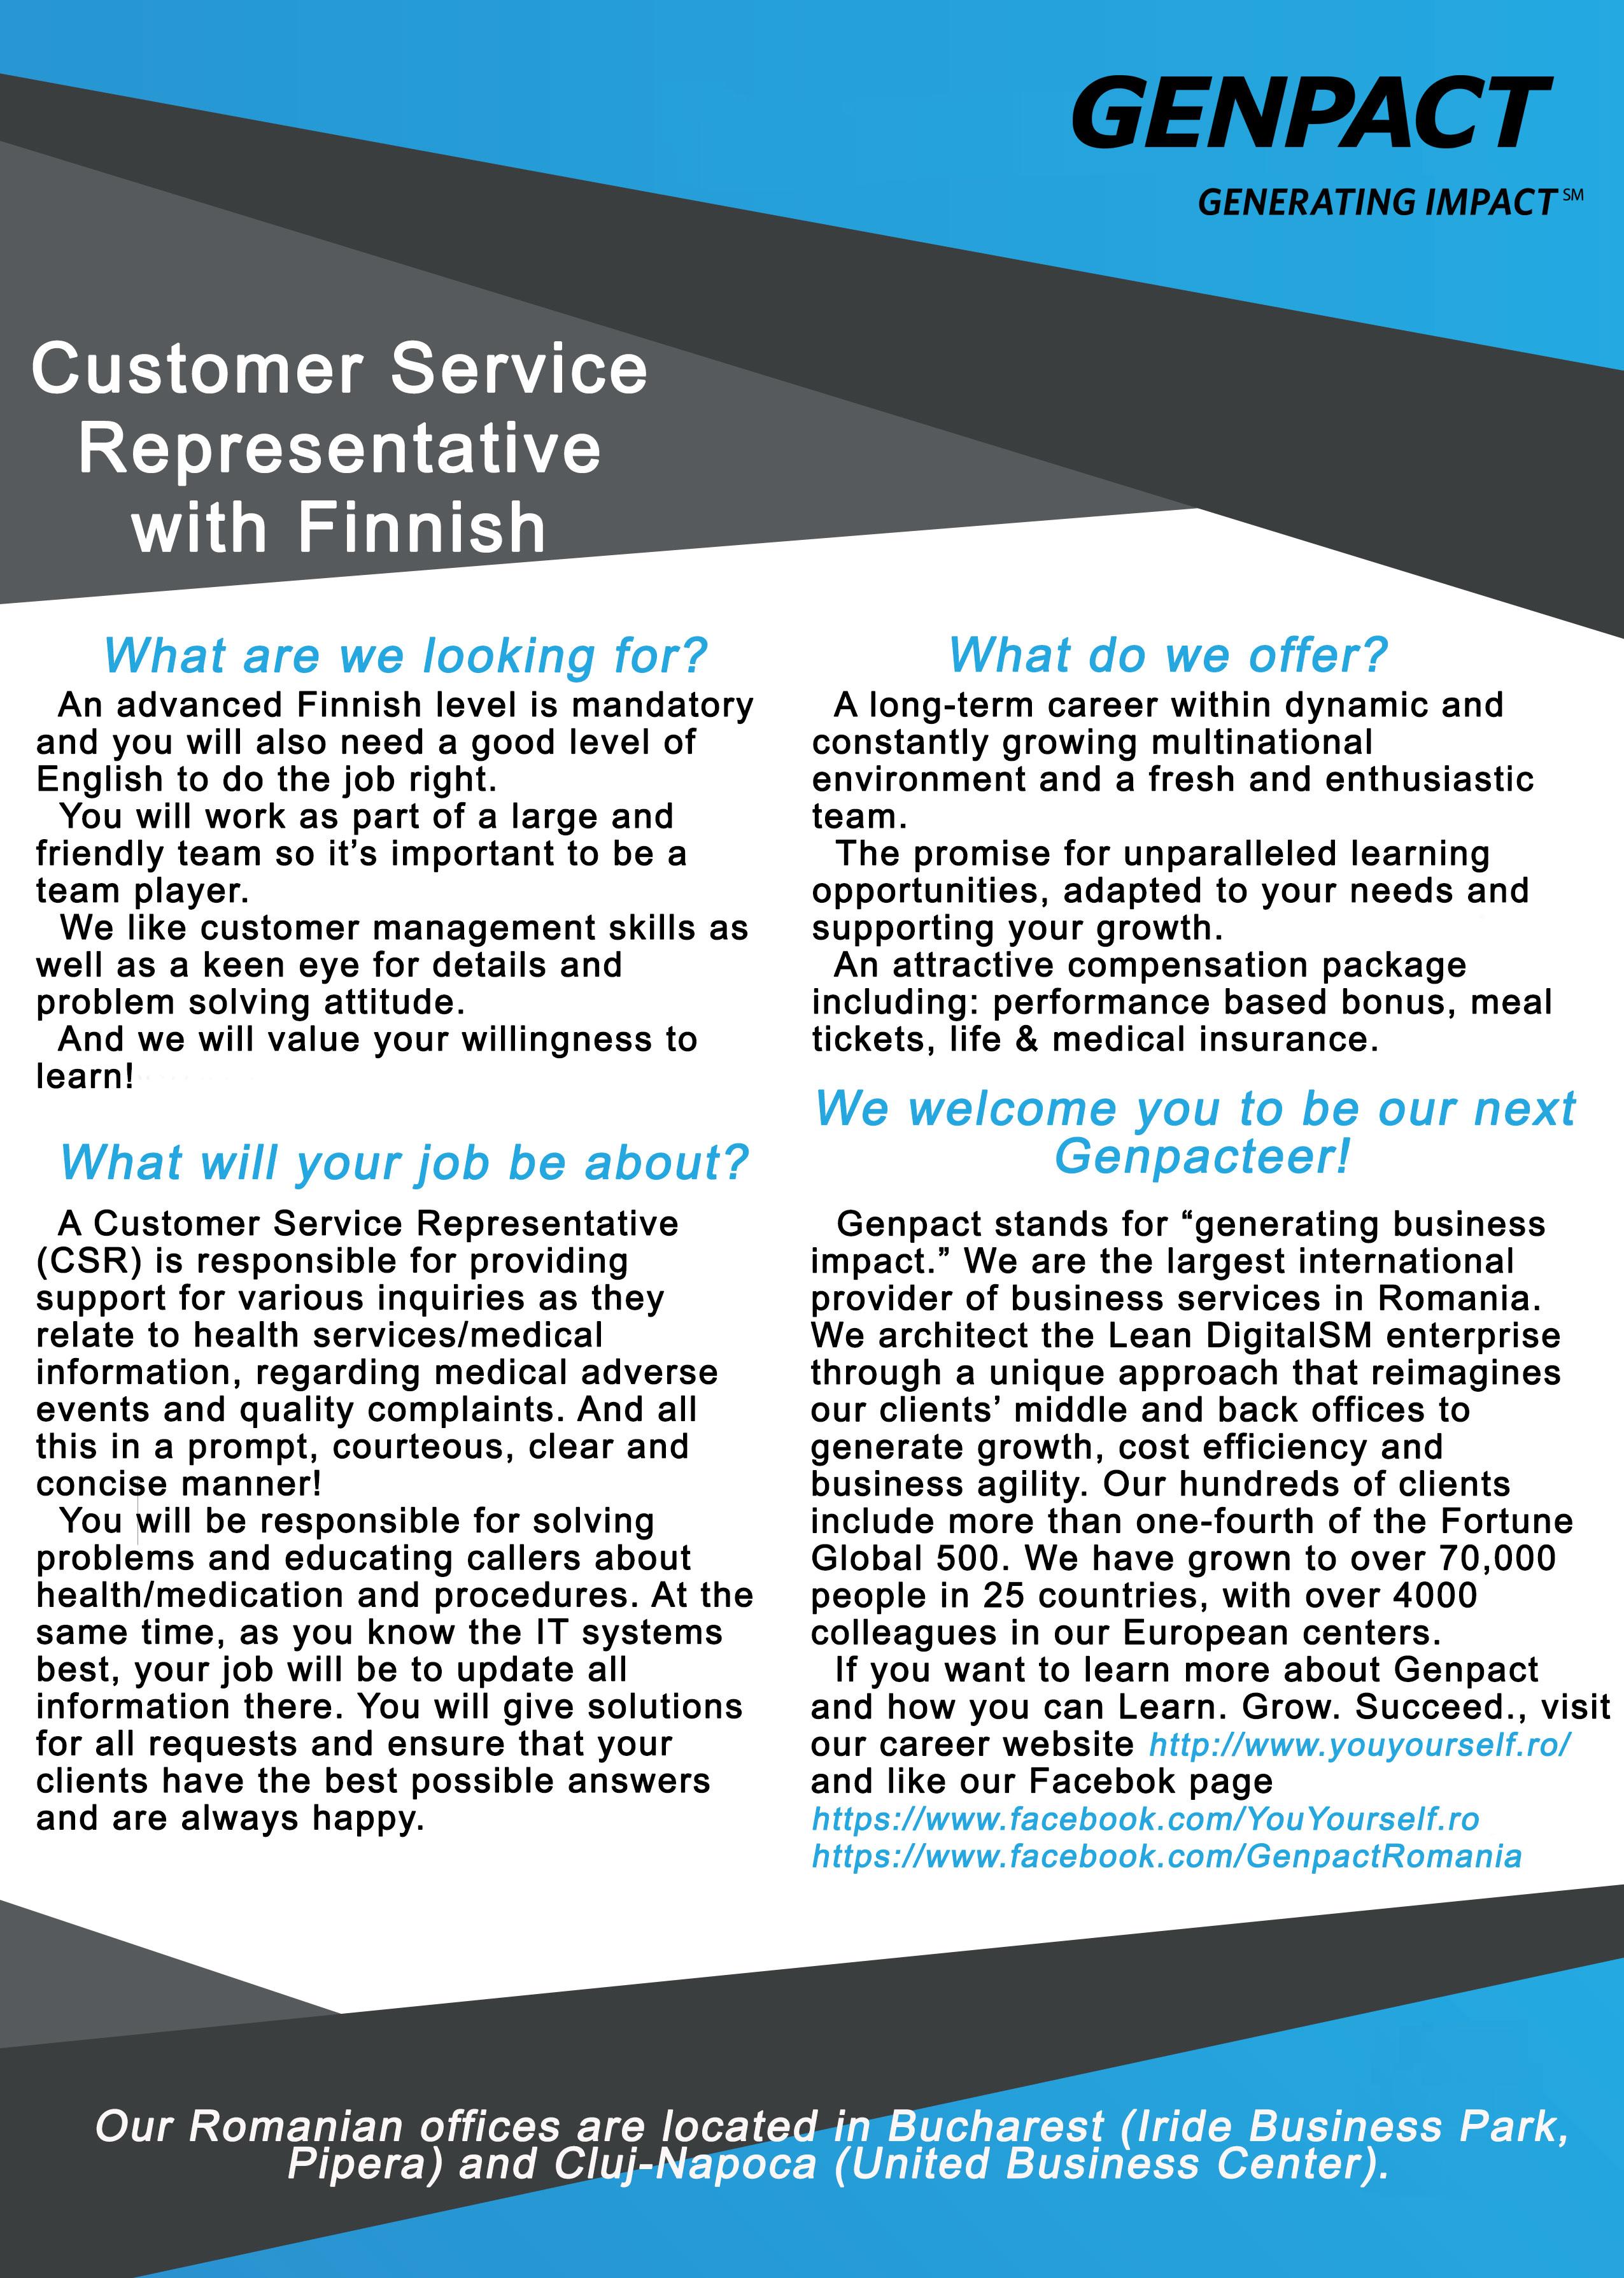 Customer Service Representative with Finnish